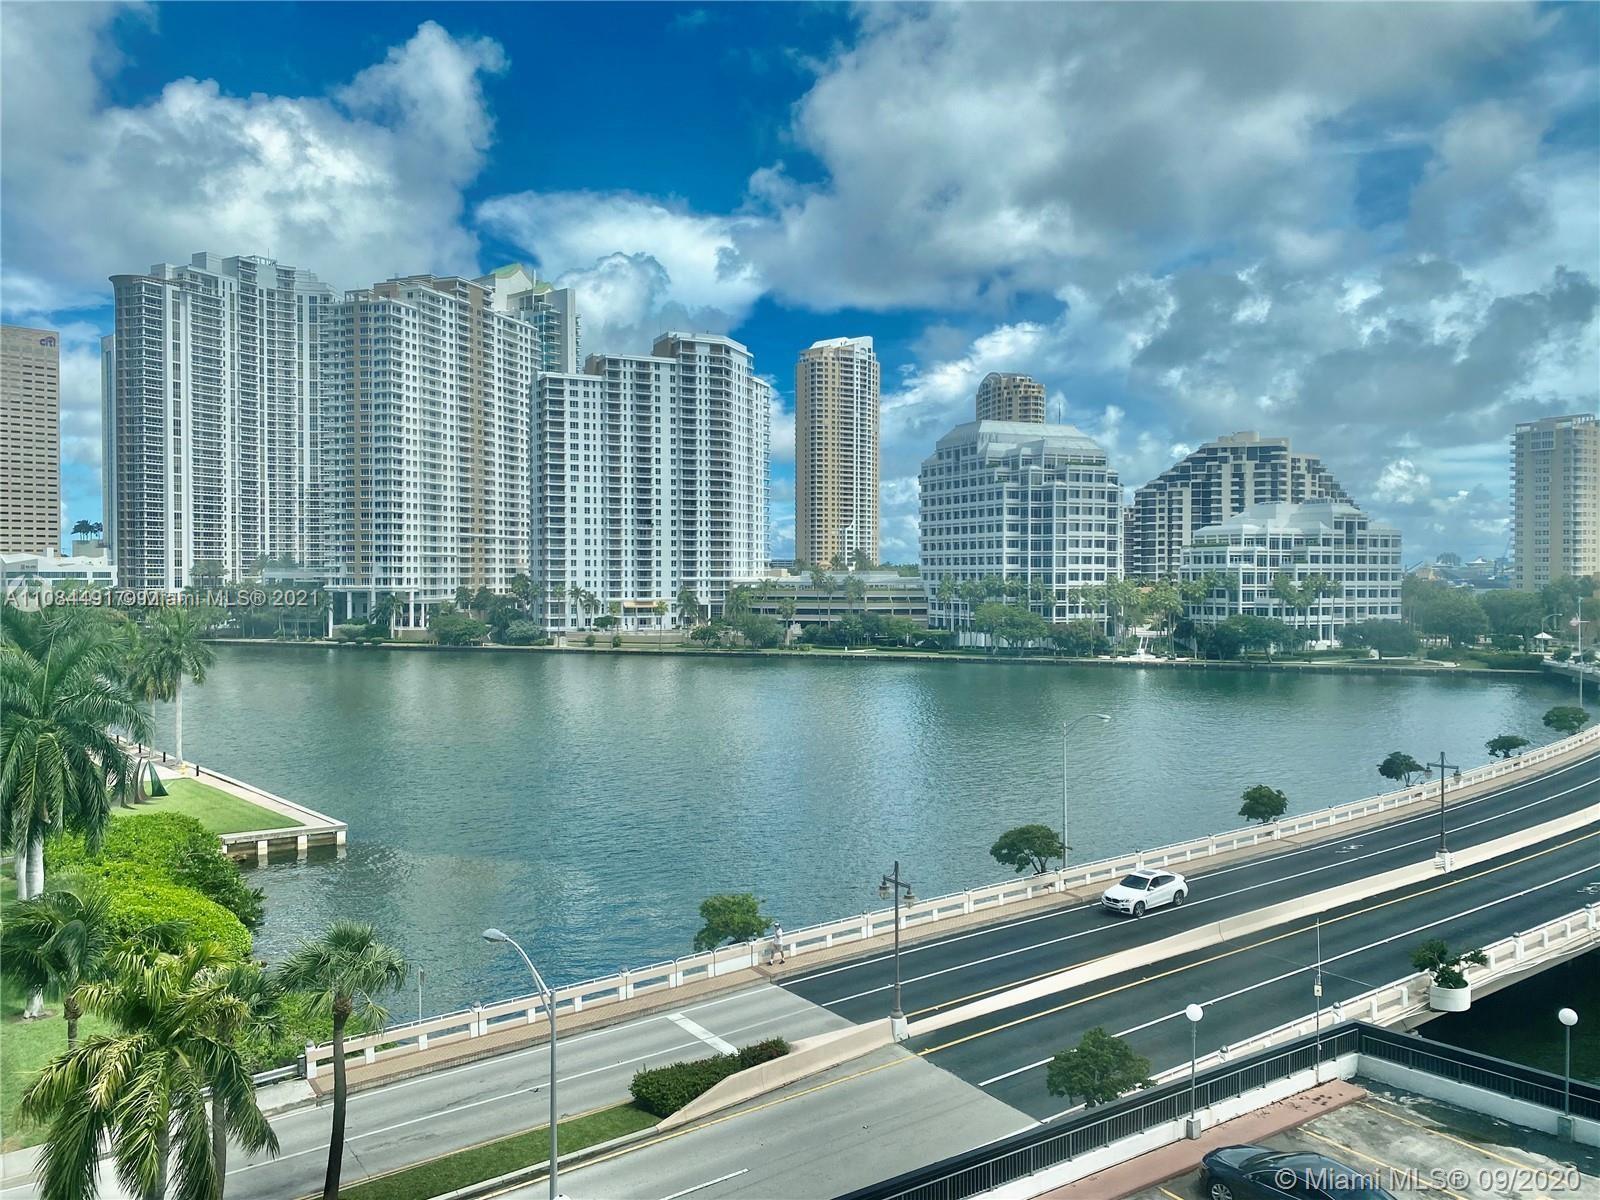 Courts Brickell Key #661 - 801 Brickell Bay Dr #661, Miami, FL 33131